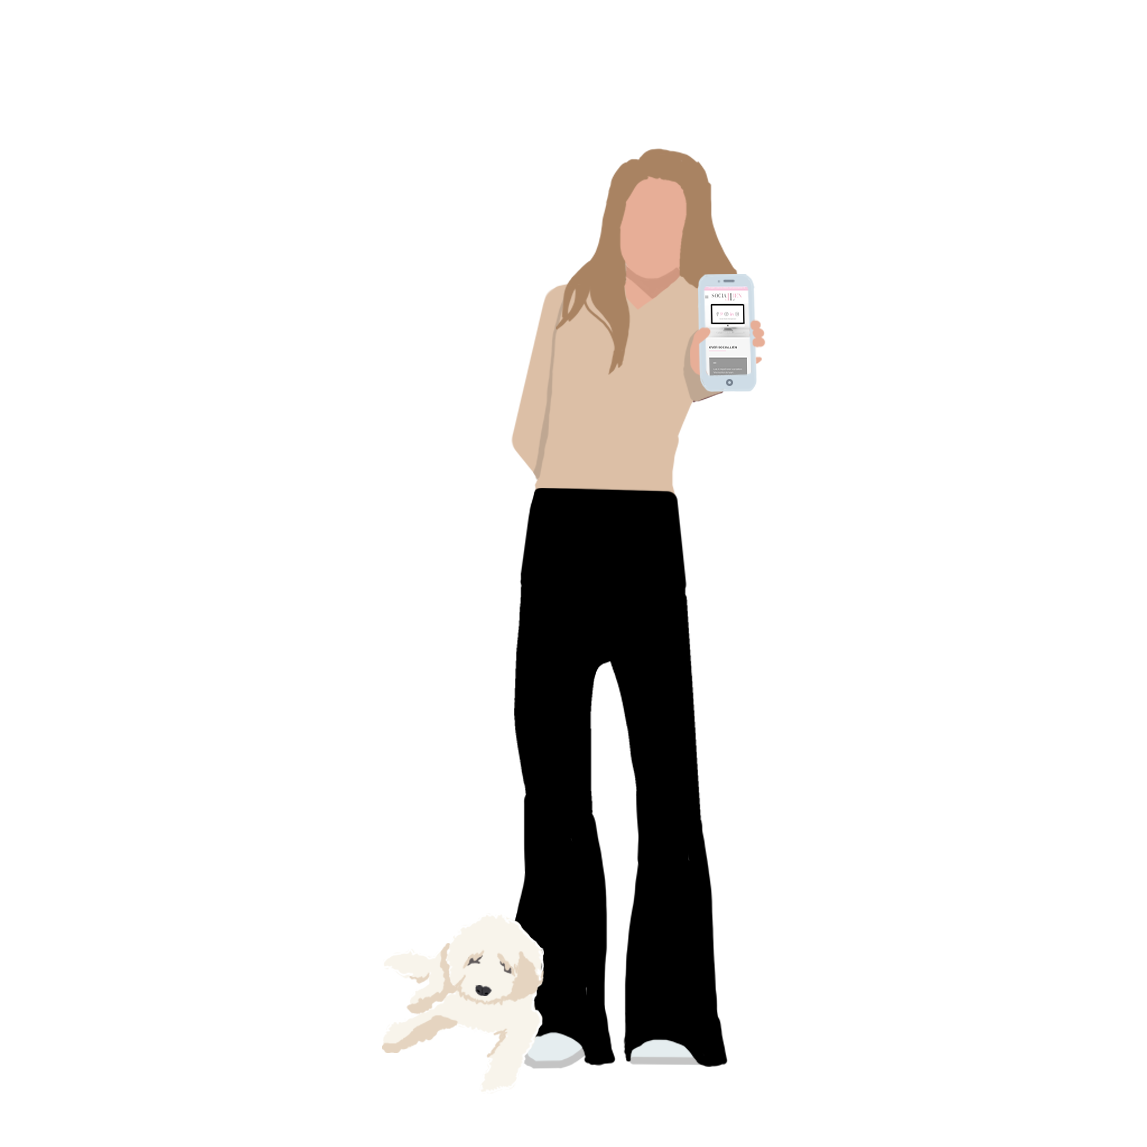 Laurien-made-marketing-avatar